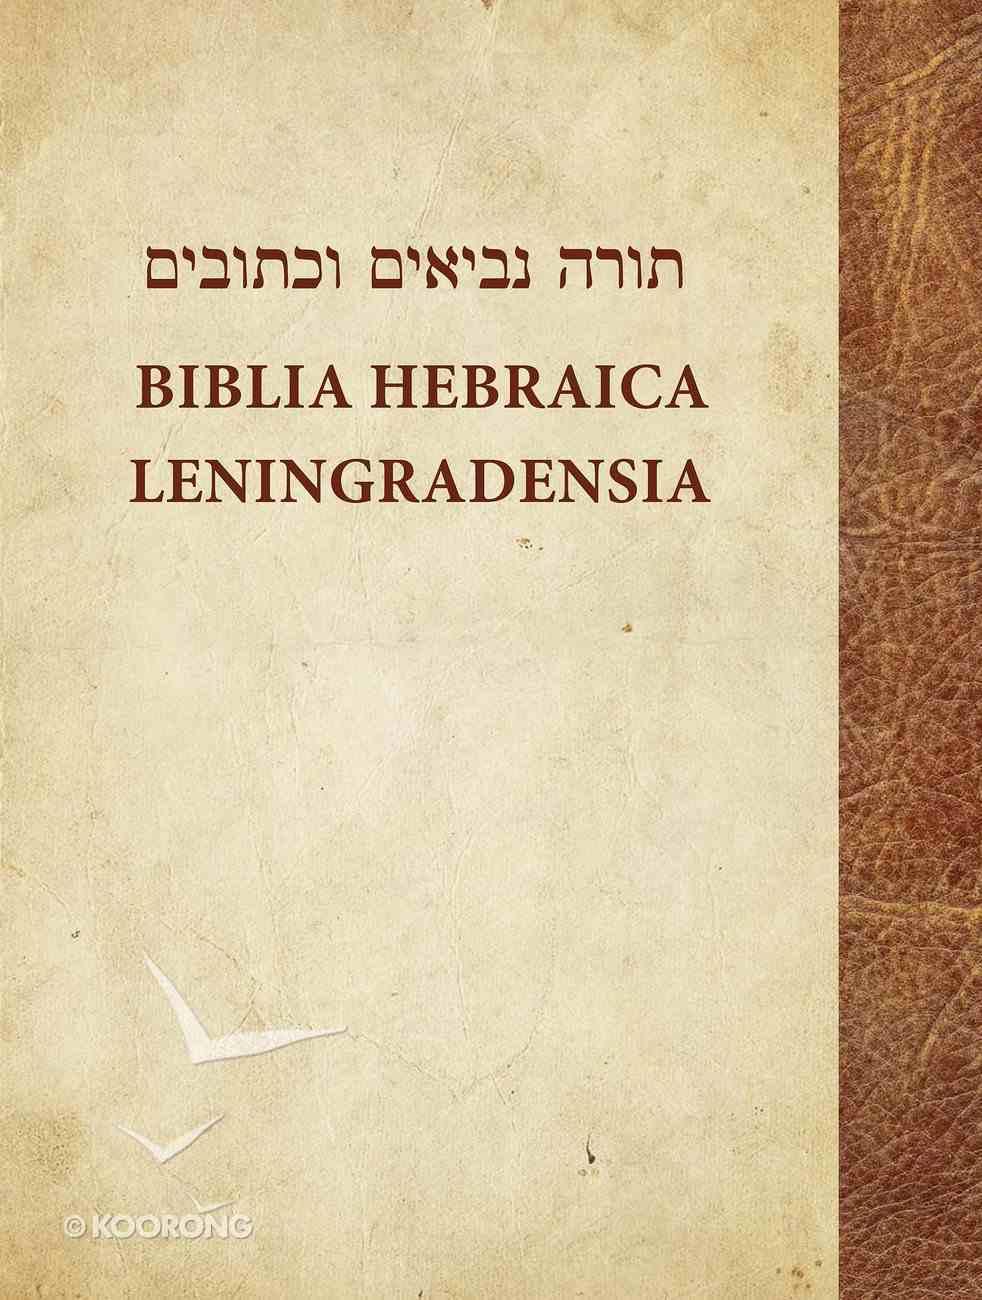 Biblia Hebraica Leningradensia Paperback